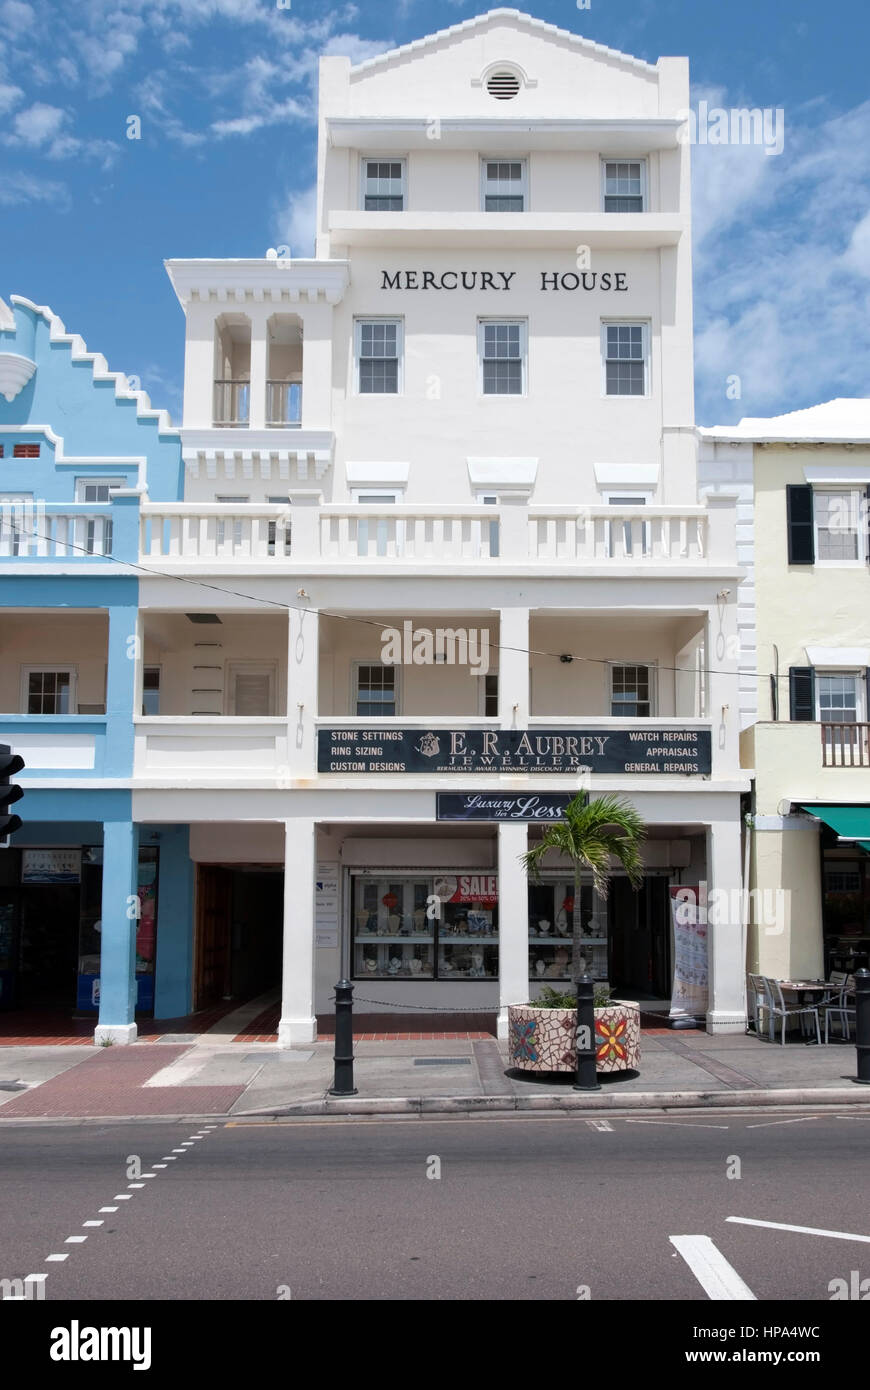 E.R. Aubrey Jeweller Shop Mercury House Front Street Hamilton Bermuda exterior view traditional Bermudian bright - Stock Image